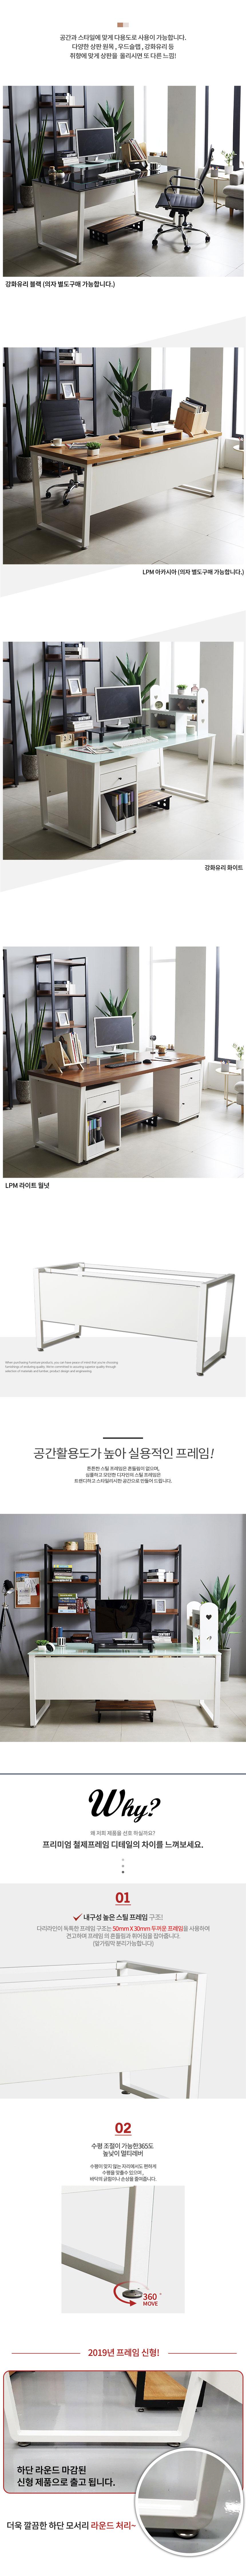 K54 1200 책상프레임 - 동화속나무, 152,000원, DIY 책상/의자, DIY 책상/테이블